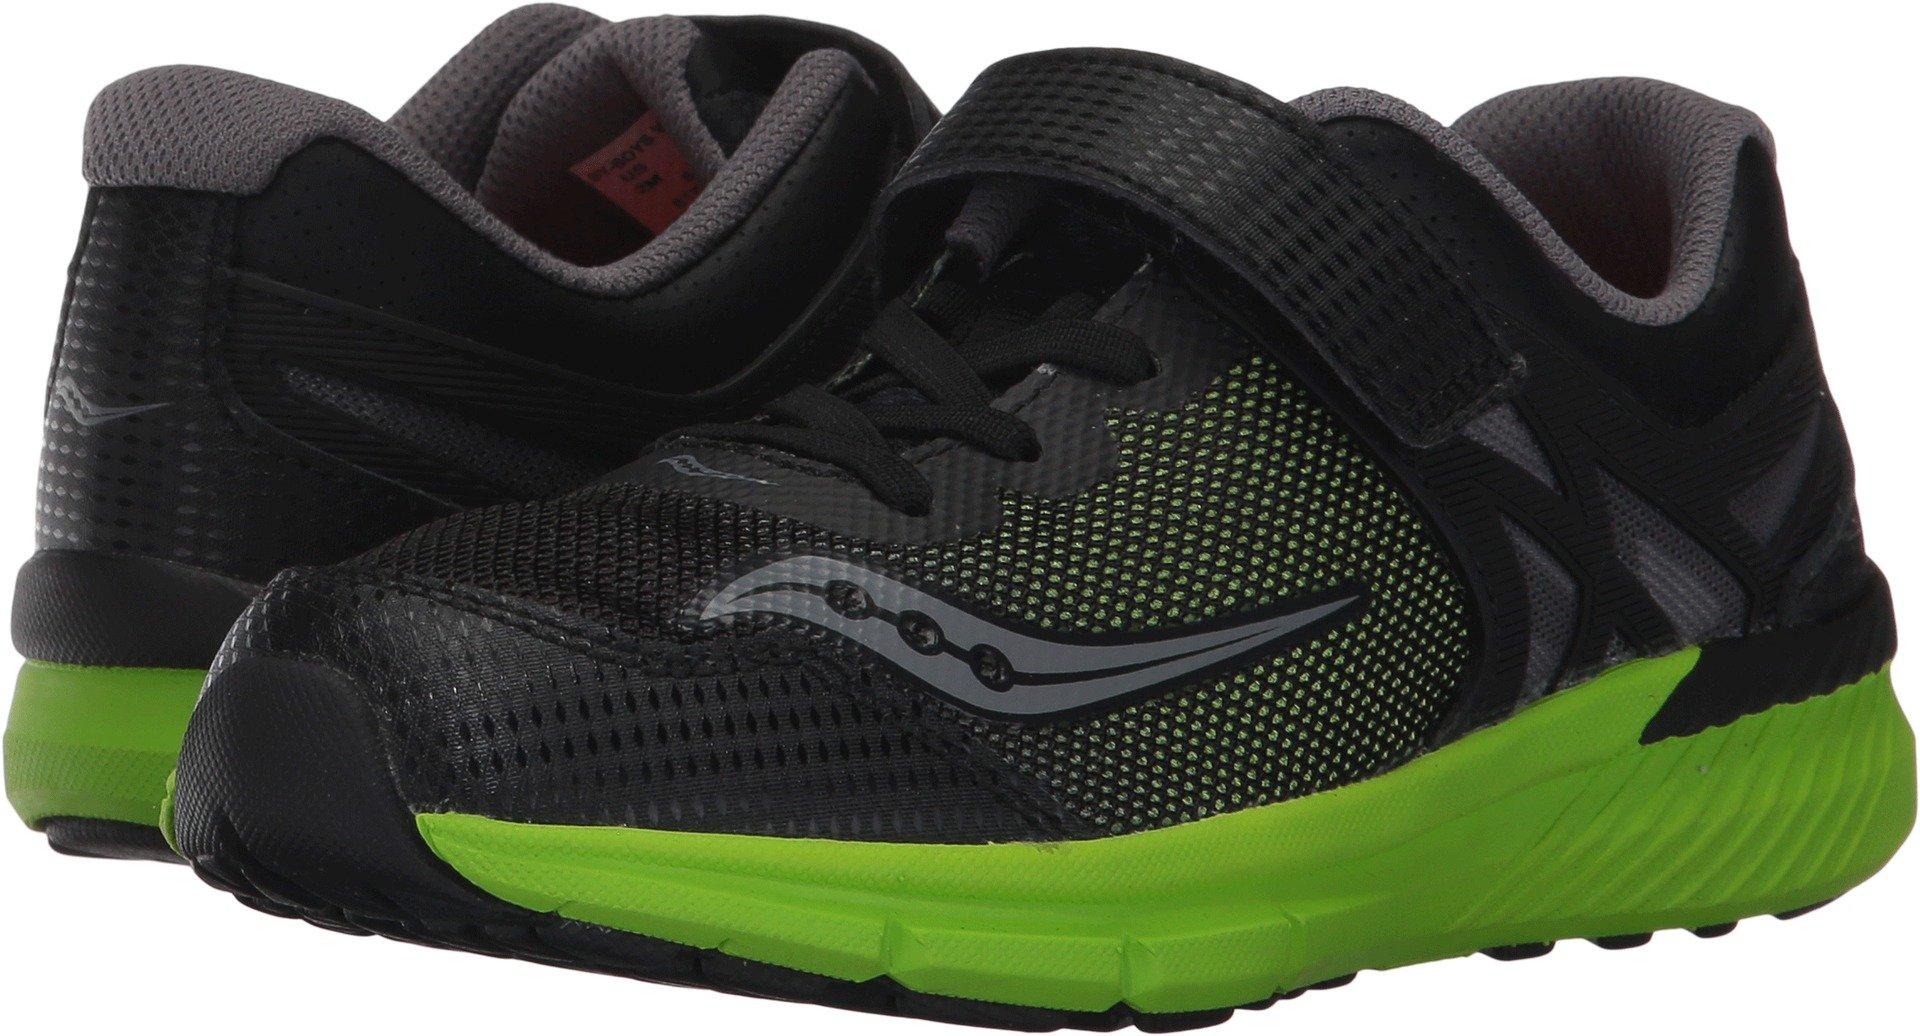 Saucony Velocity A/C Running Shoe (Little Kid), Black/Green, 11 W US Little Kid